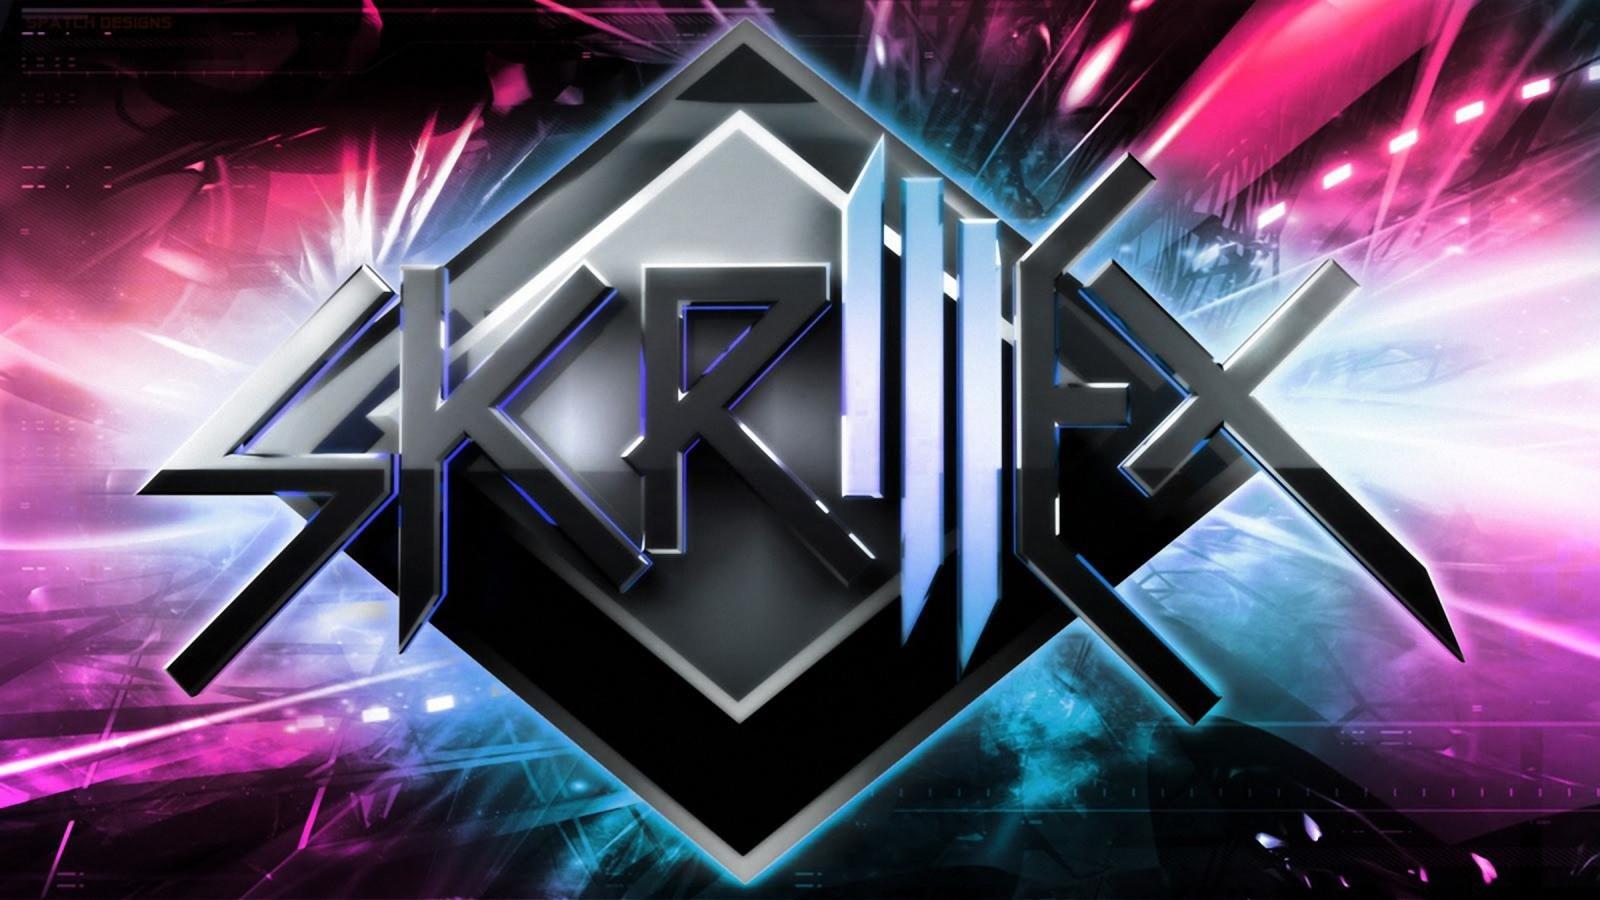 Free Download Skrillex Wallpaper ID227270 Hd 1600x900 For Computer